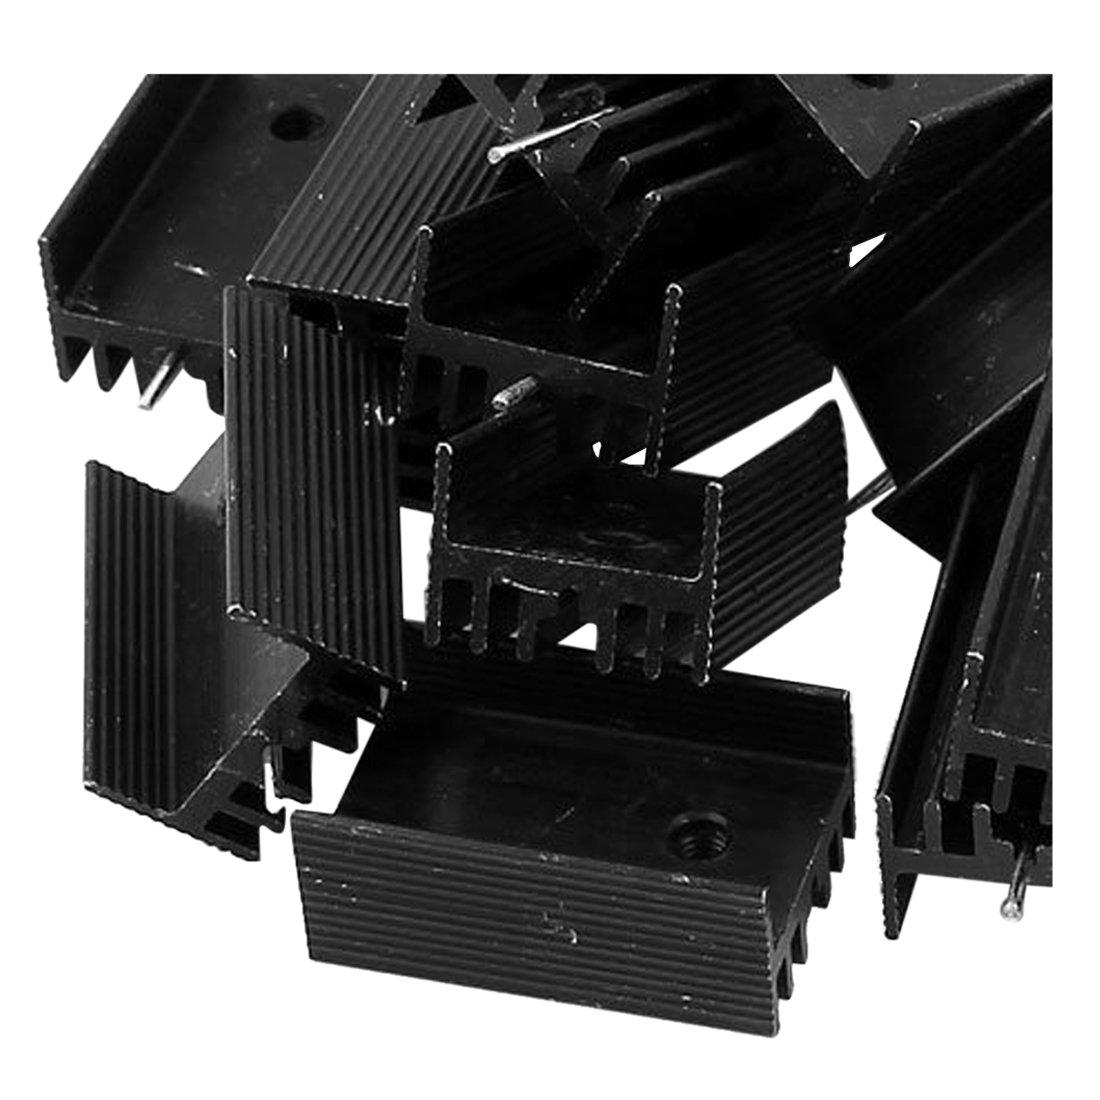 WOVELOT 20xnoir Aluminium radiateur Dissipateur 25 x 15 x 10mm pour TO-220 IC